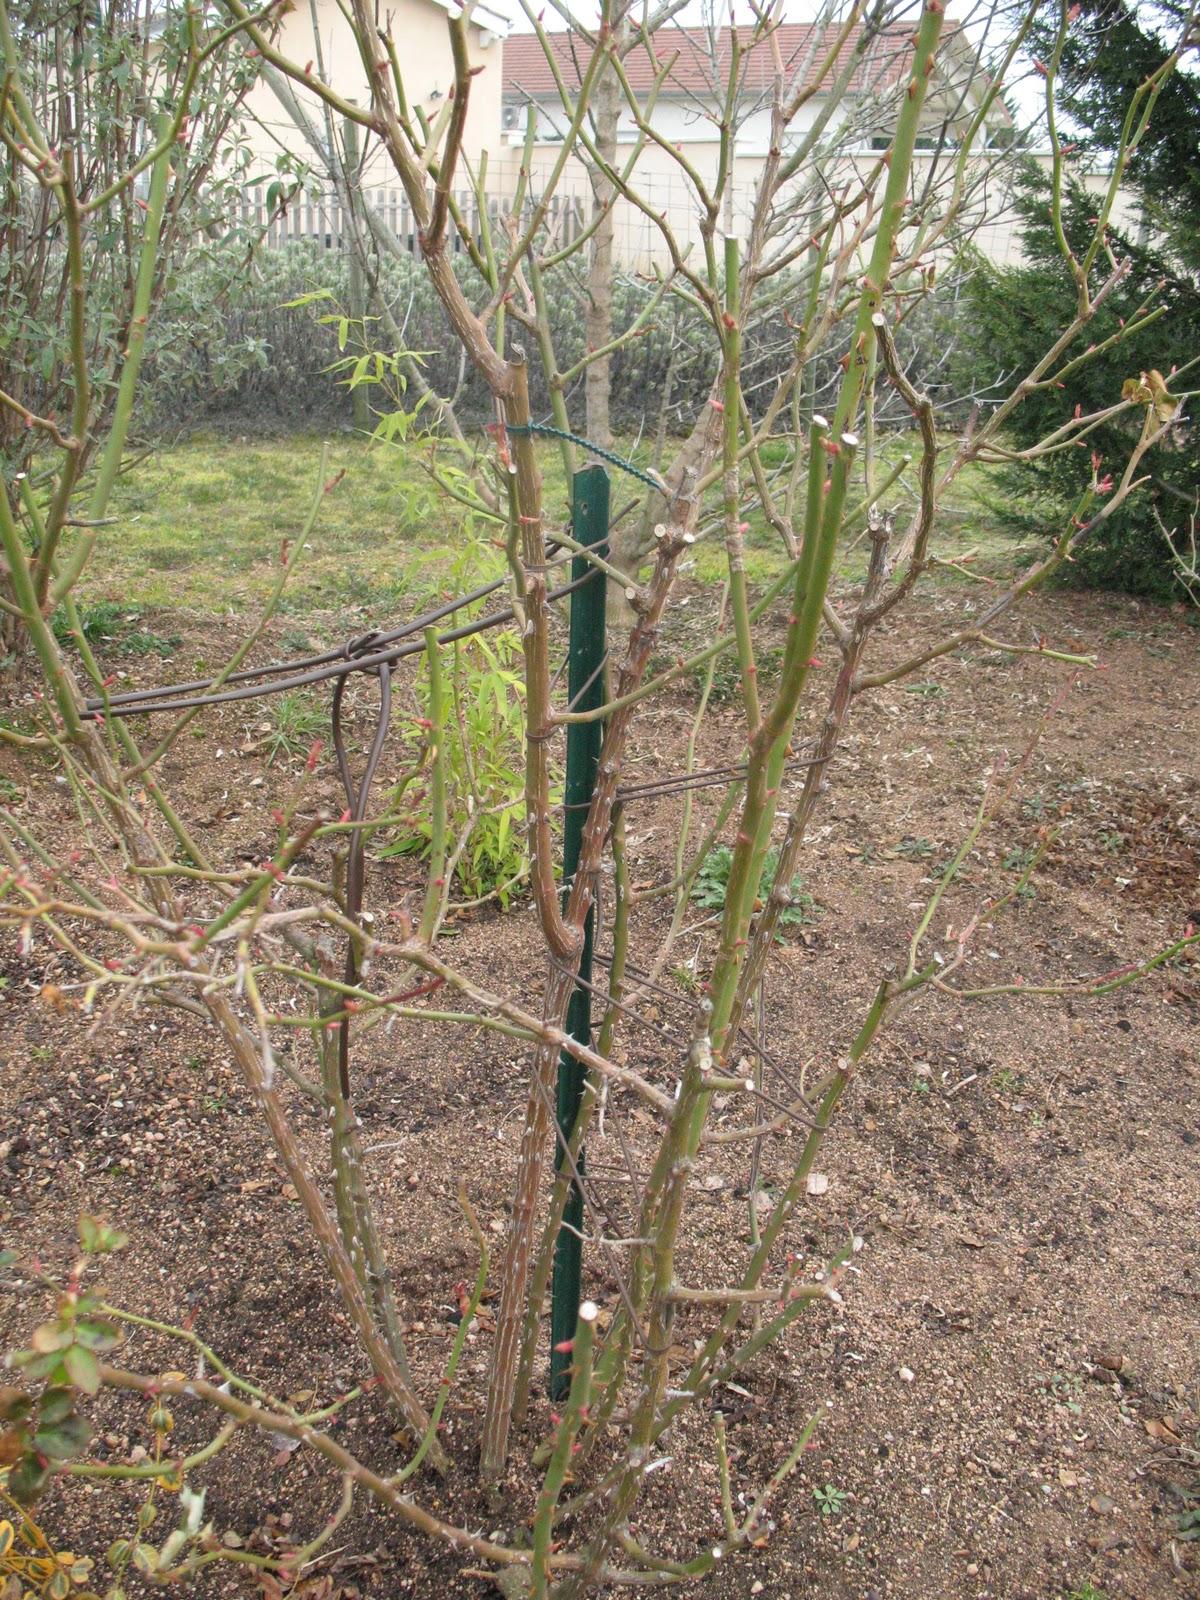 Roses du jardin ch neland taille des rosiers - Taille des framboisiers non remontants ...